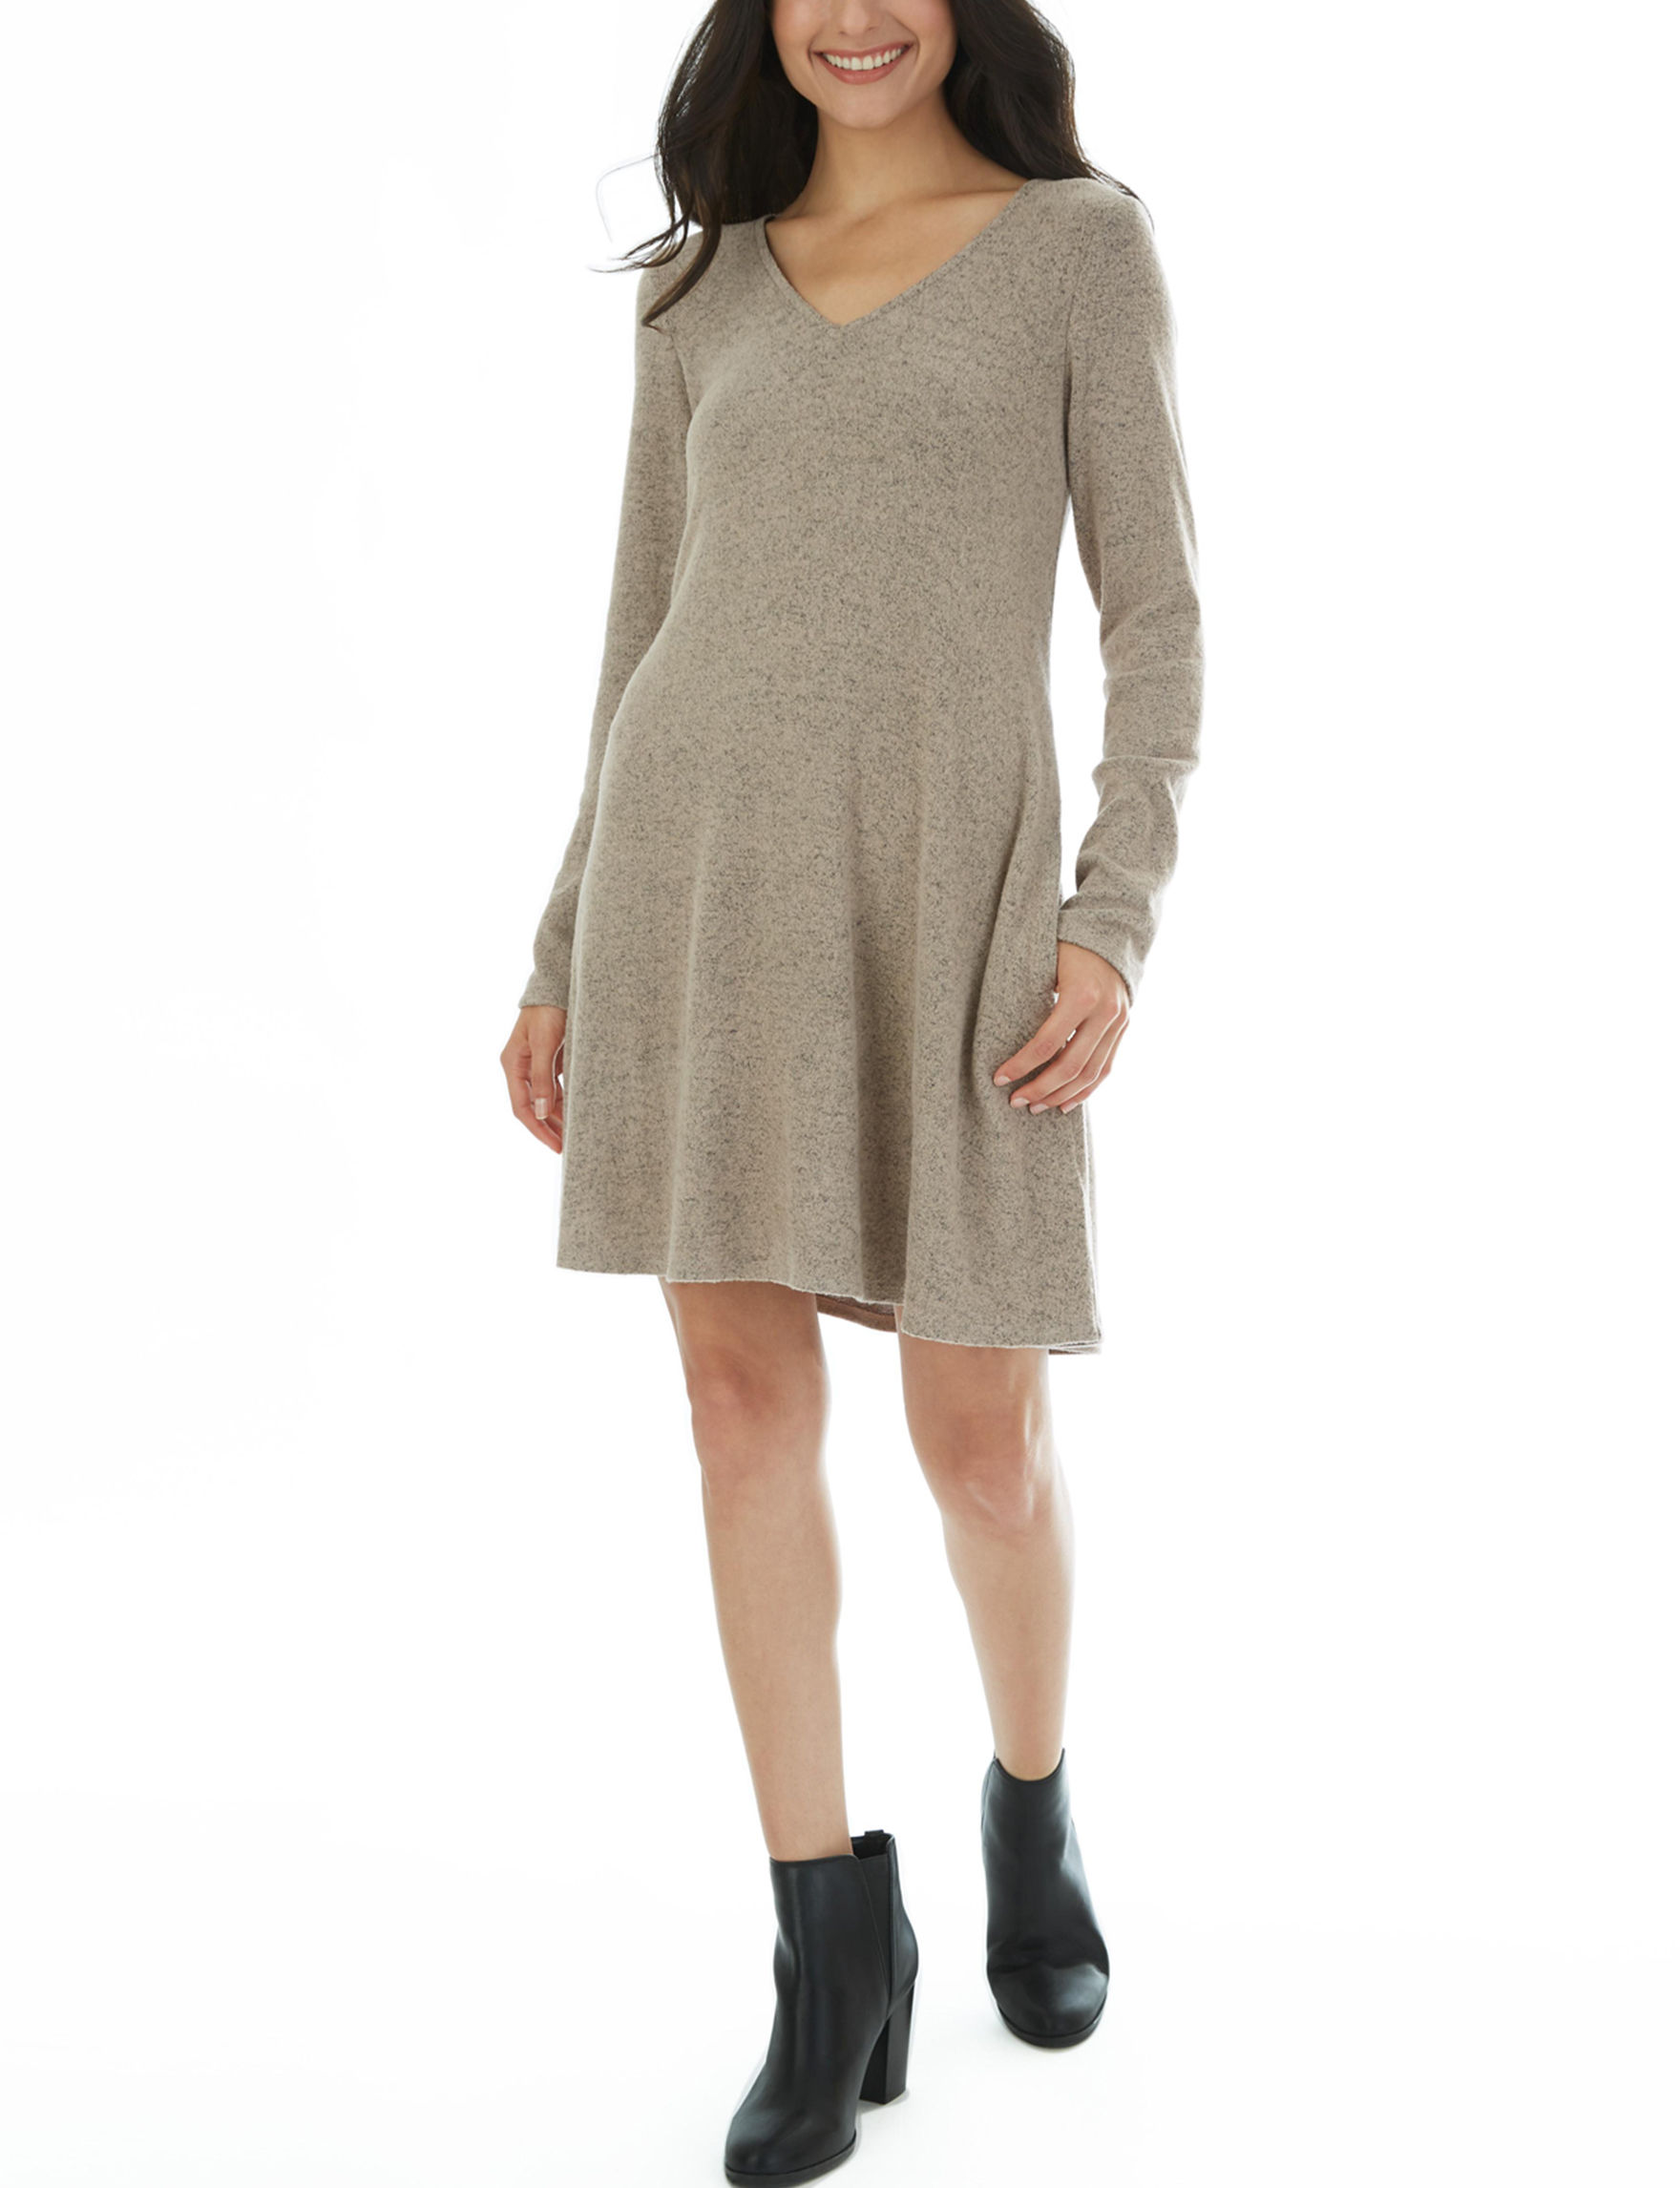 A. Byer Mocha Everyday & Casual Shift Dresses